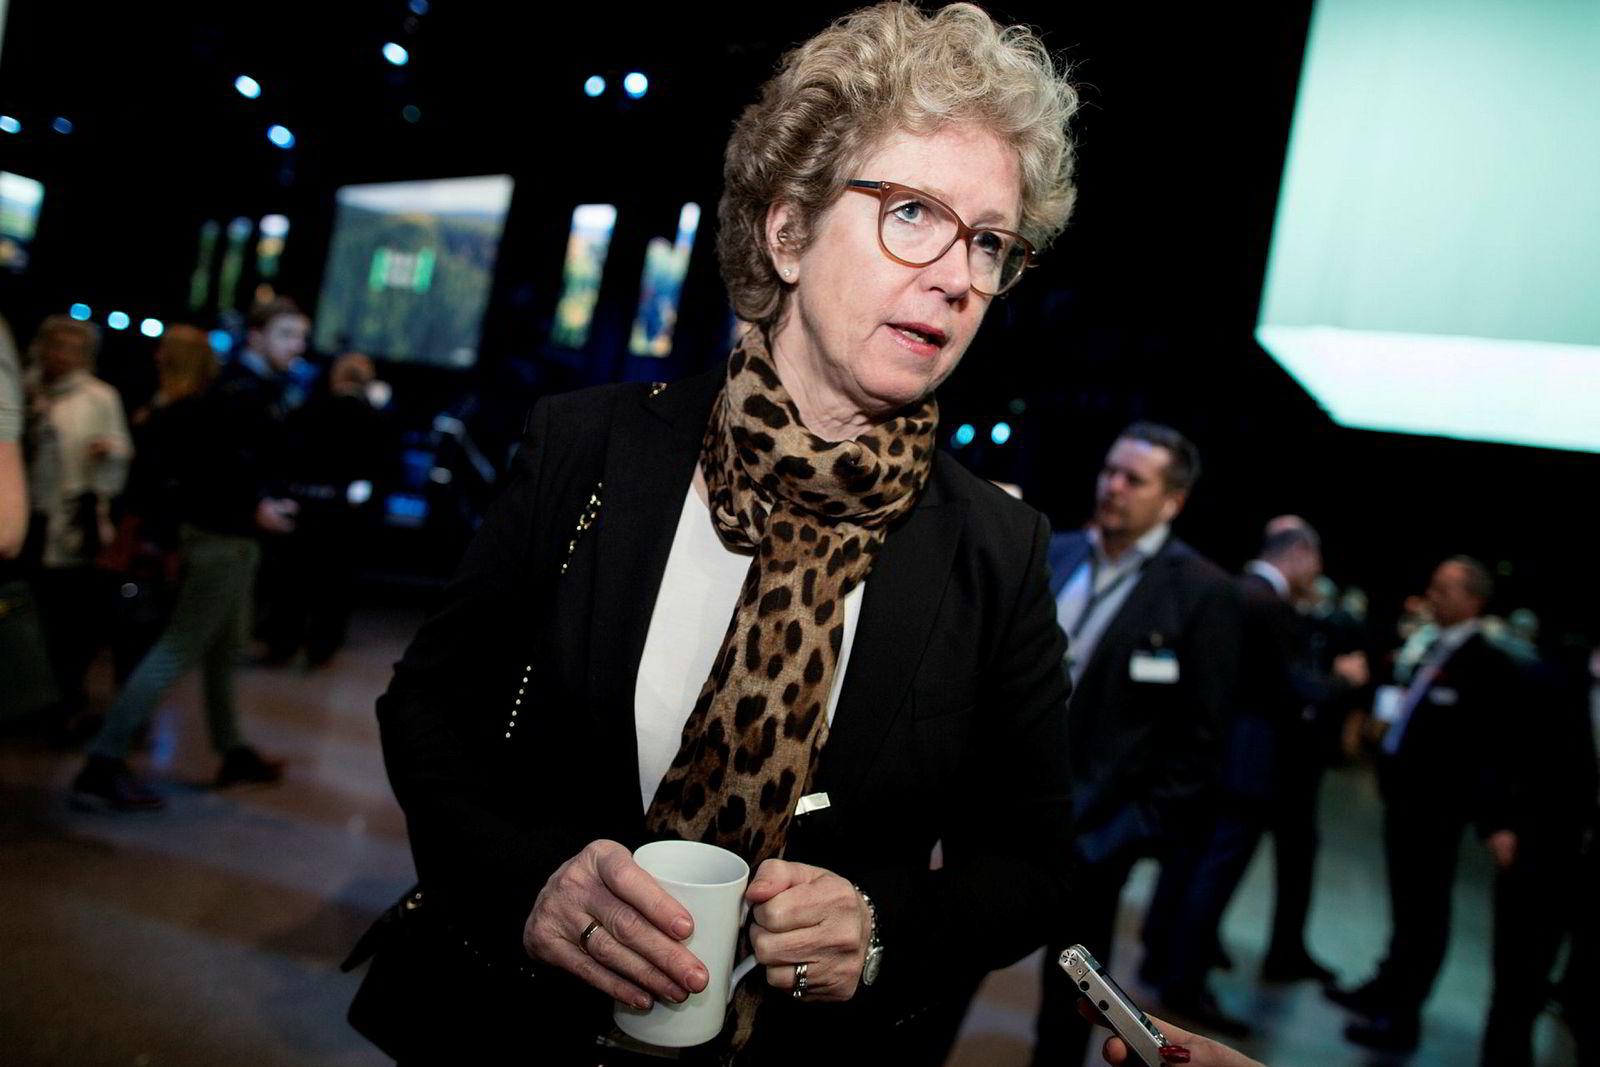 Hilde Merete Aasheim tiltrer som konsernsjef i Hydro fra 8. mai 2019.